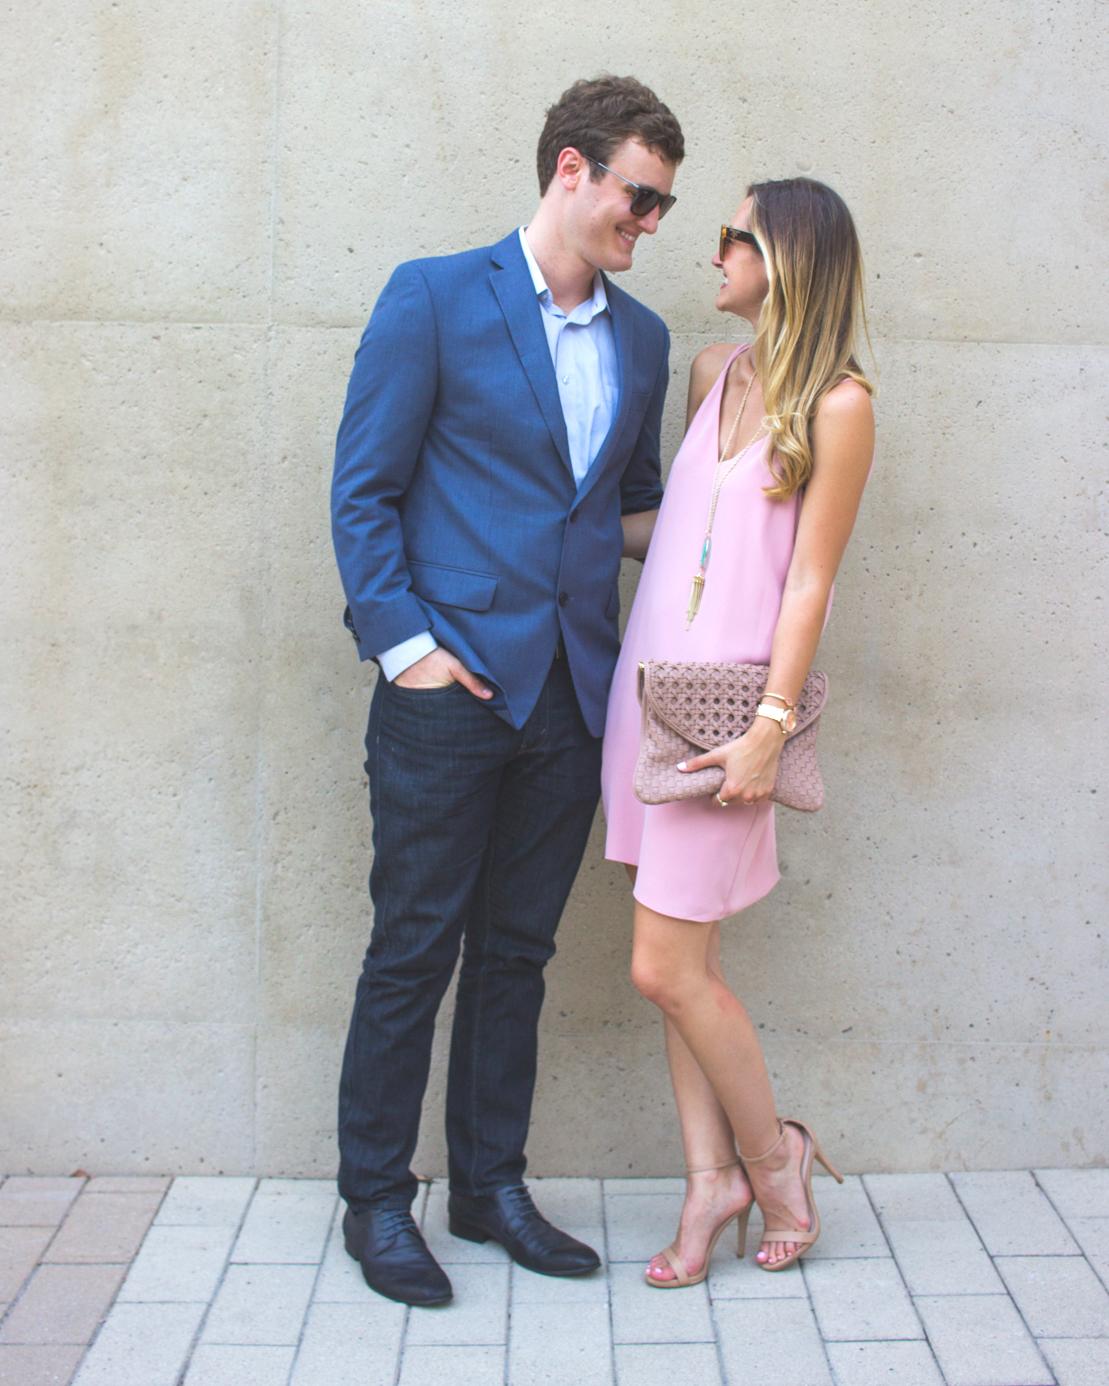 Dating scene austin texas